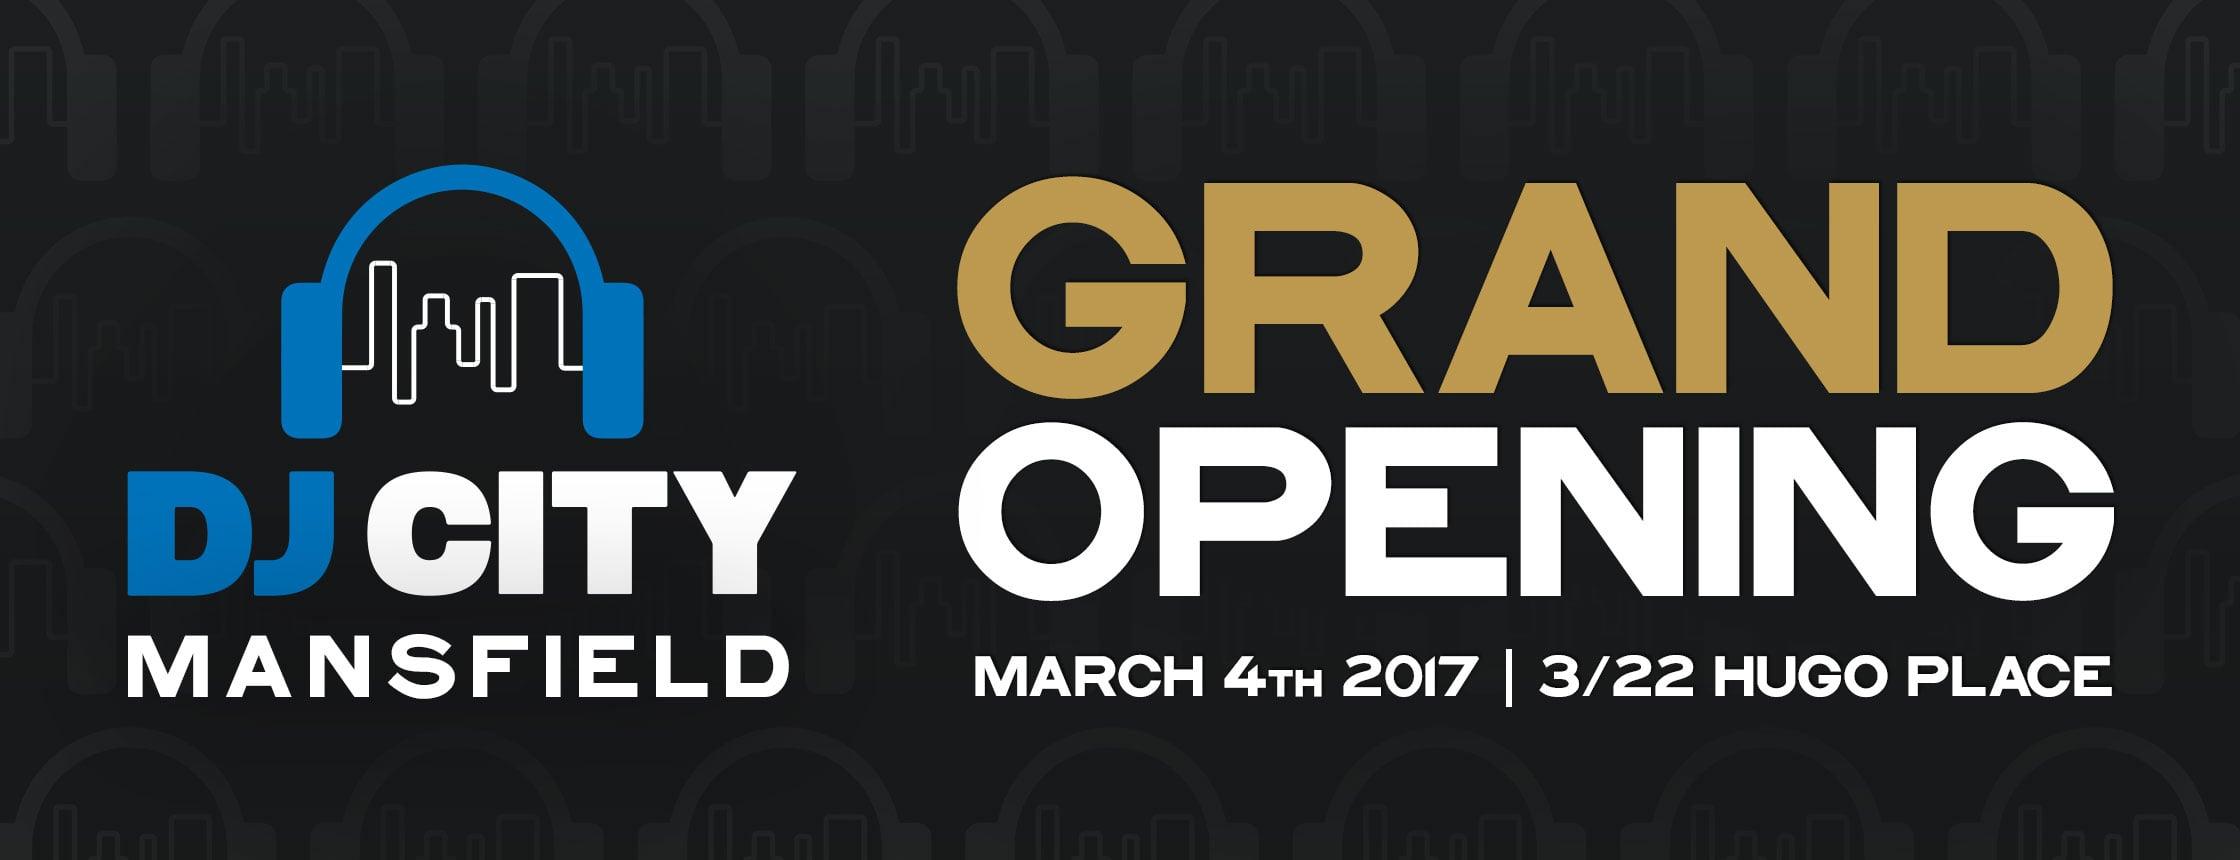 manfield_grand_opening